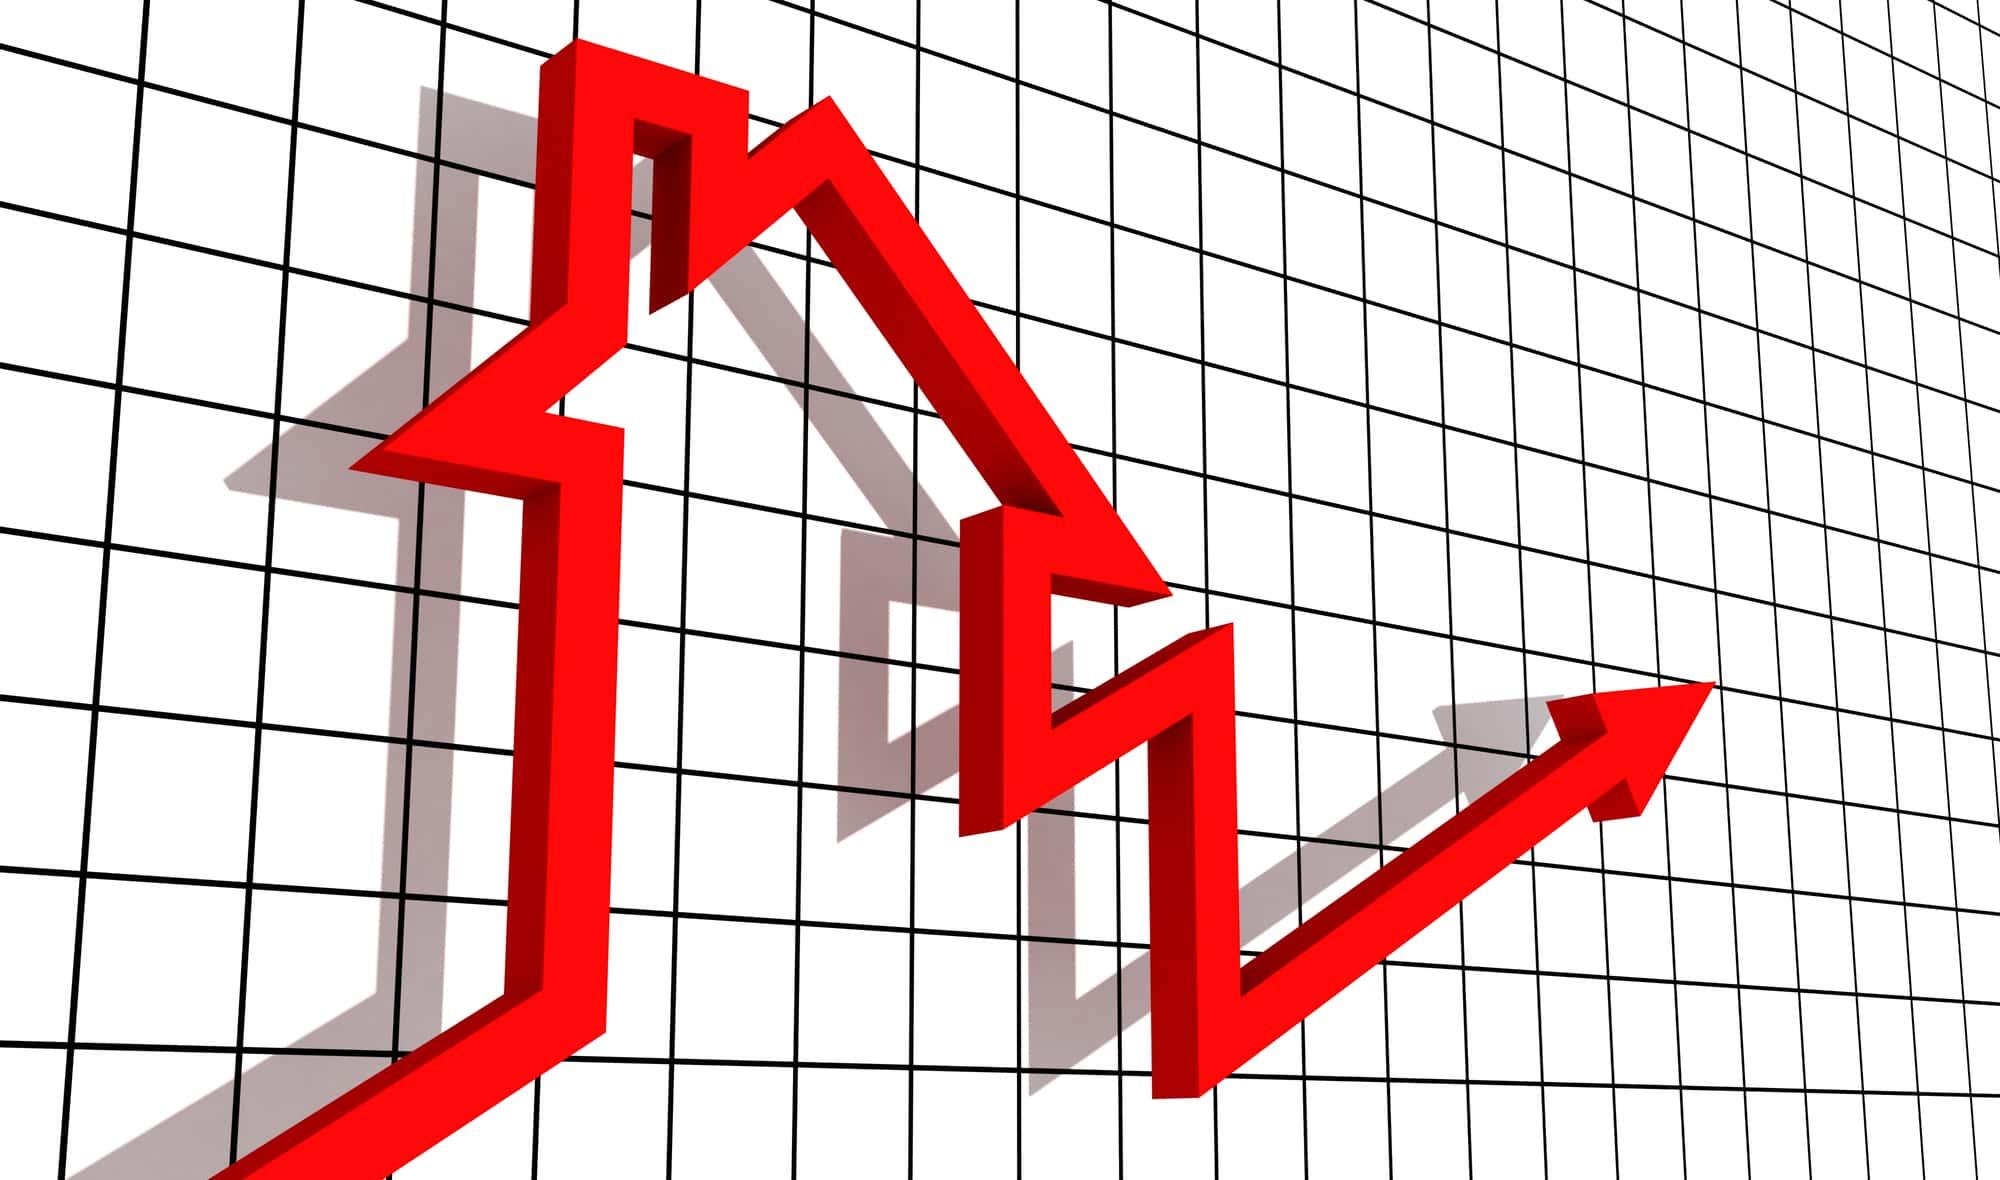 All The Housing Market - 525 Memes